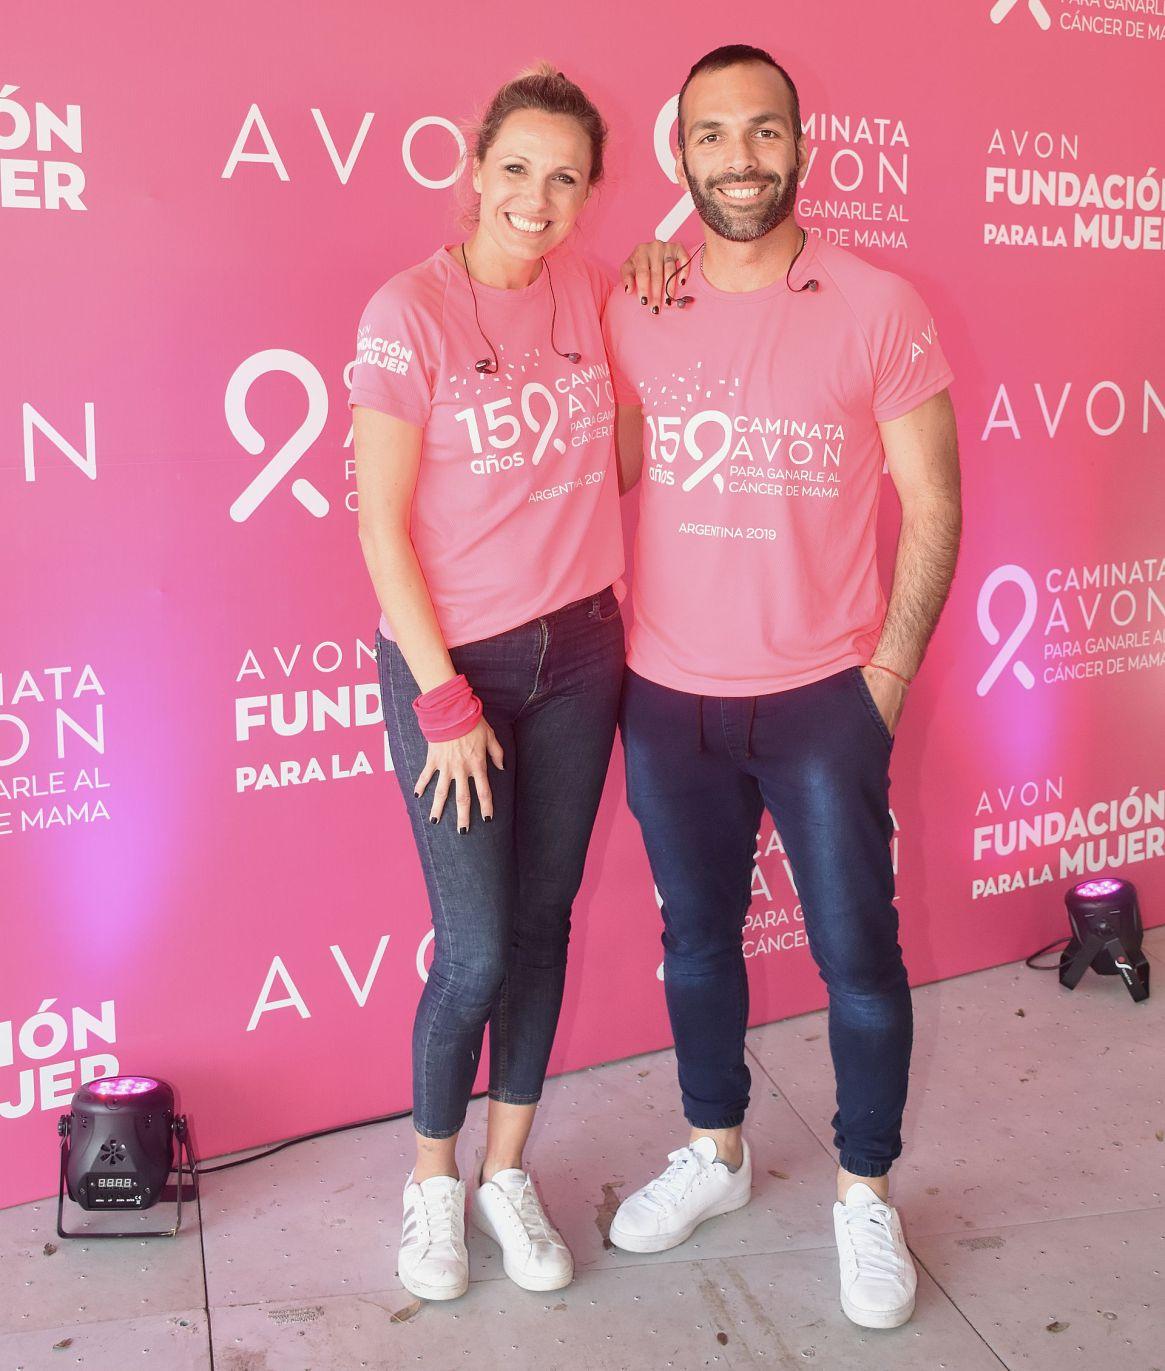 Denise Dumas y Cristian Vera